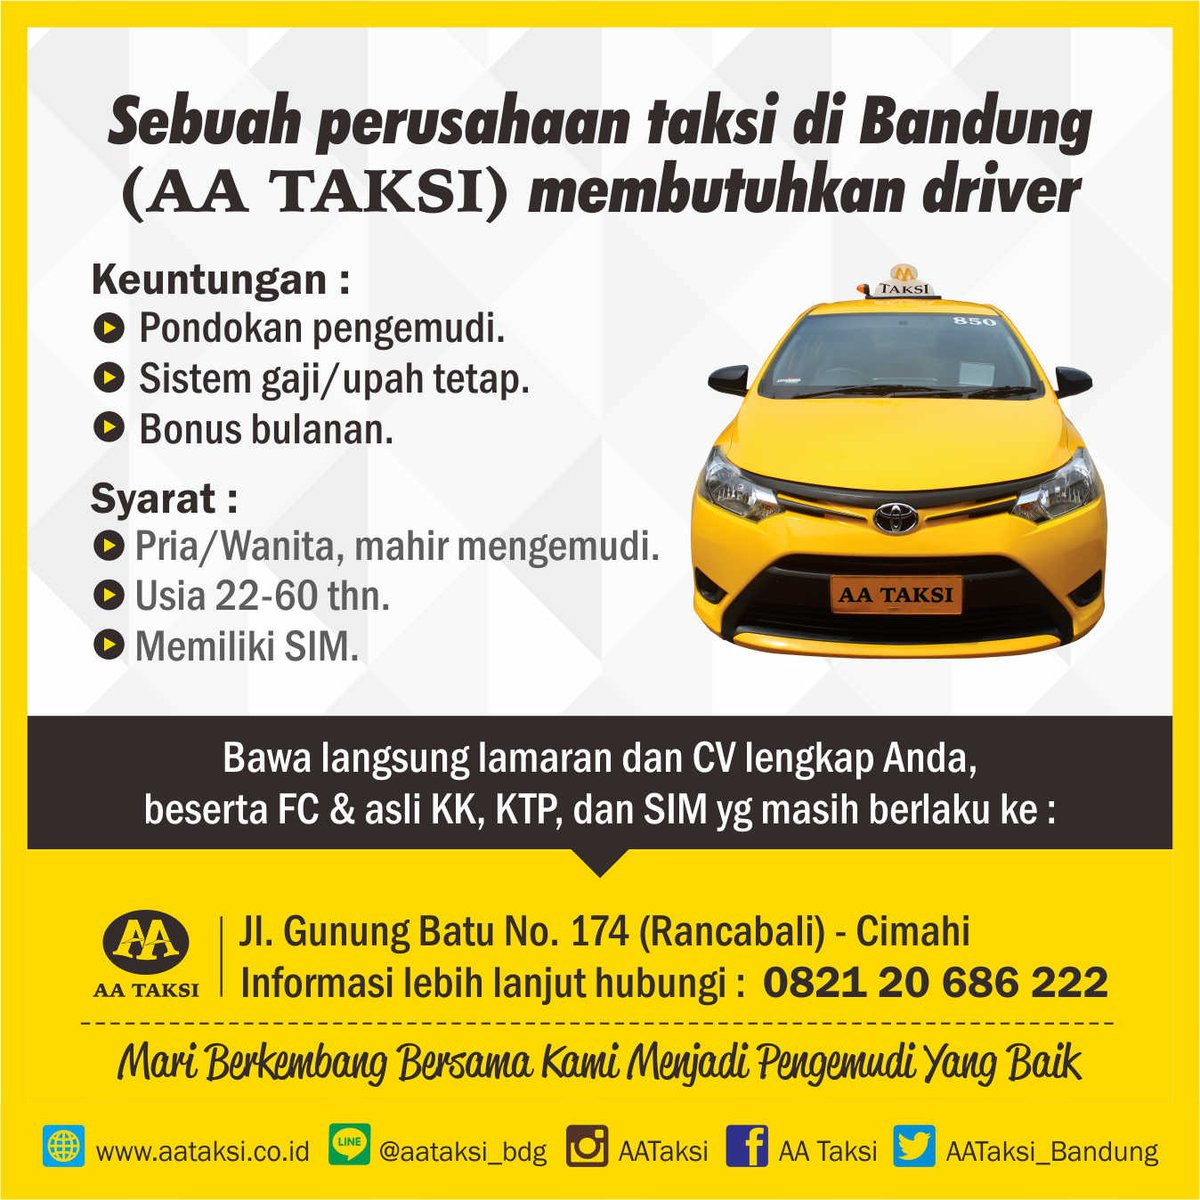 Lowongan Kerja Driver AA Taksi Bandung Oktober 2016